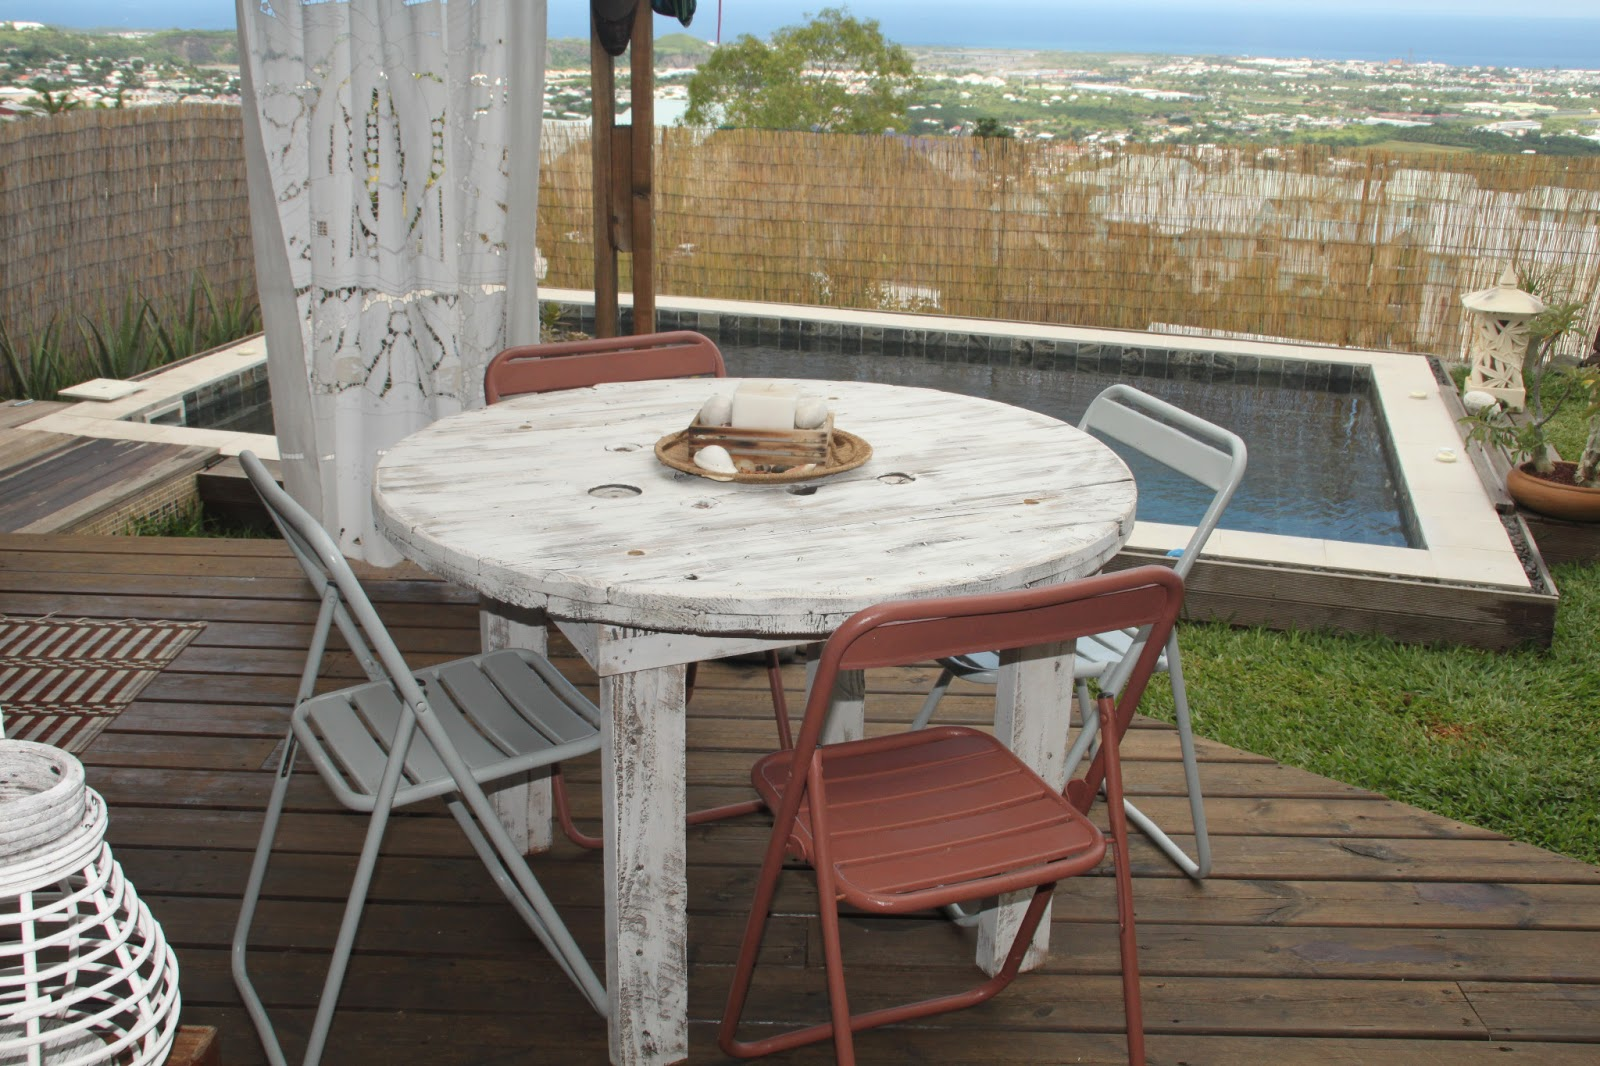 table exterieure touret. Black Bedroom Furniture Sets. Home Design Ideas